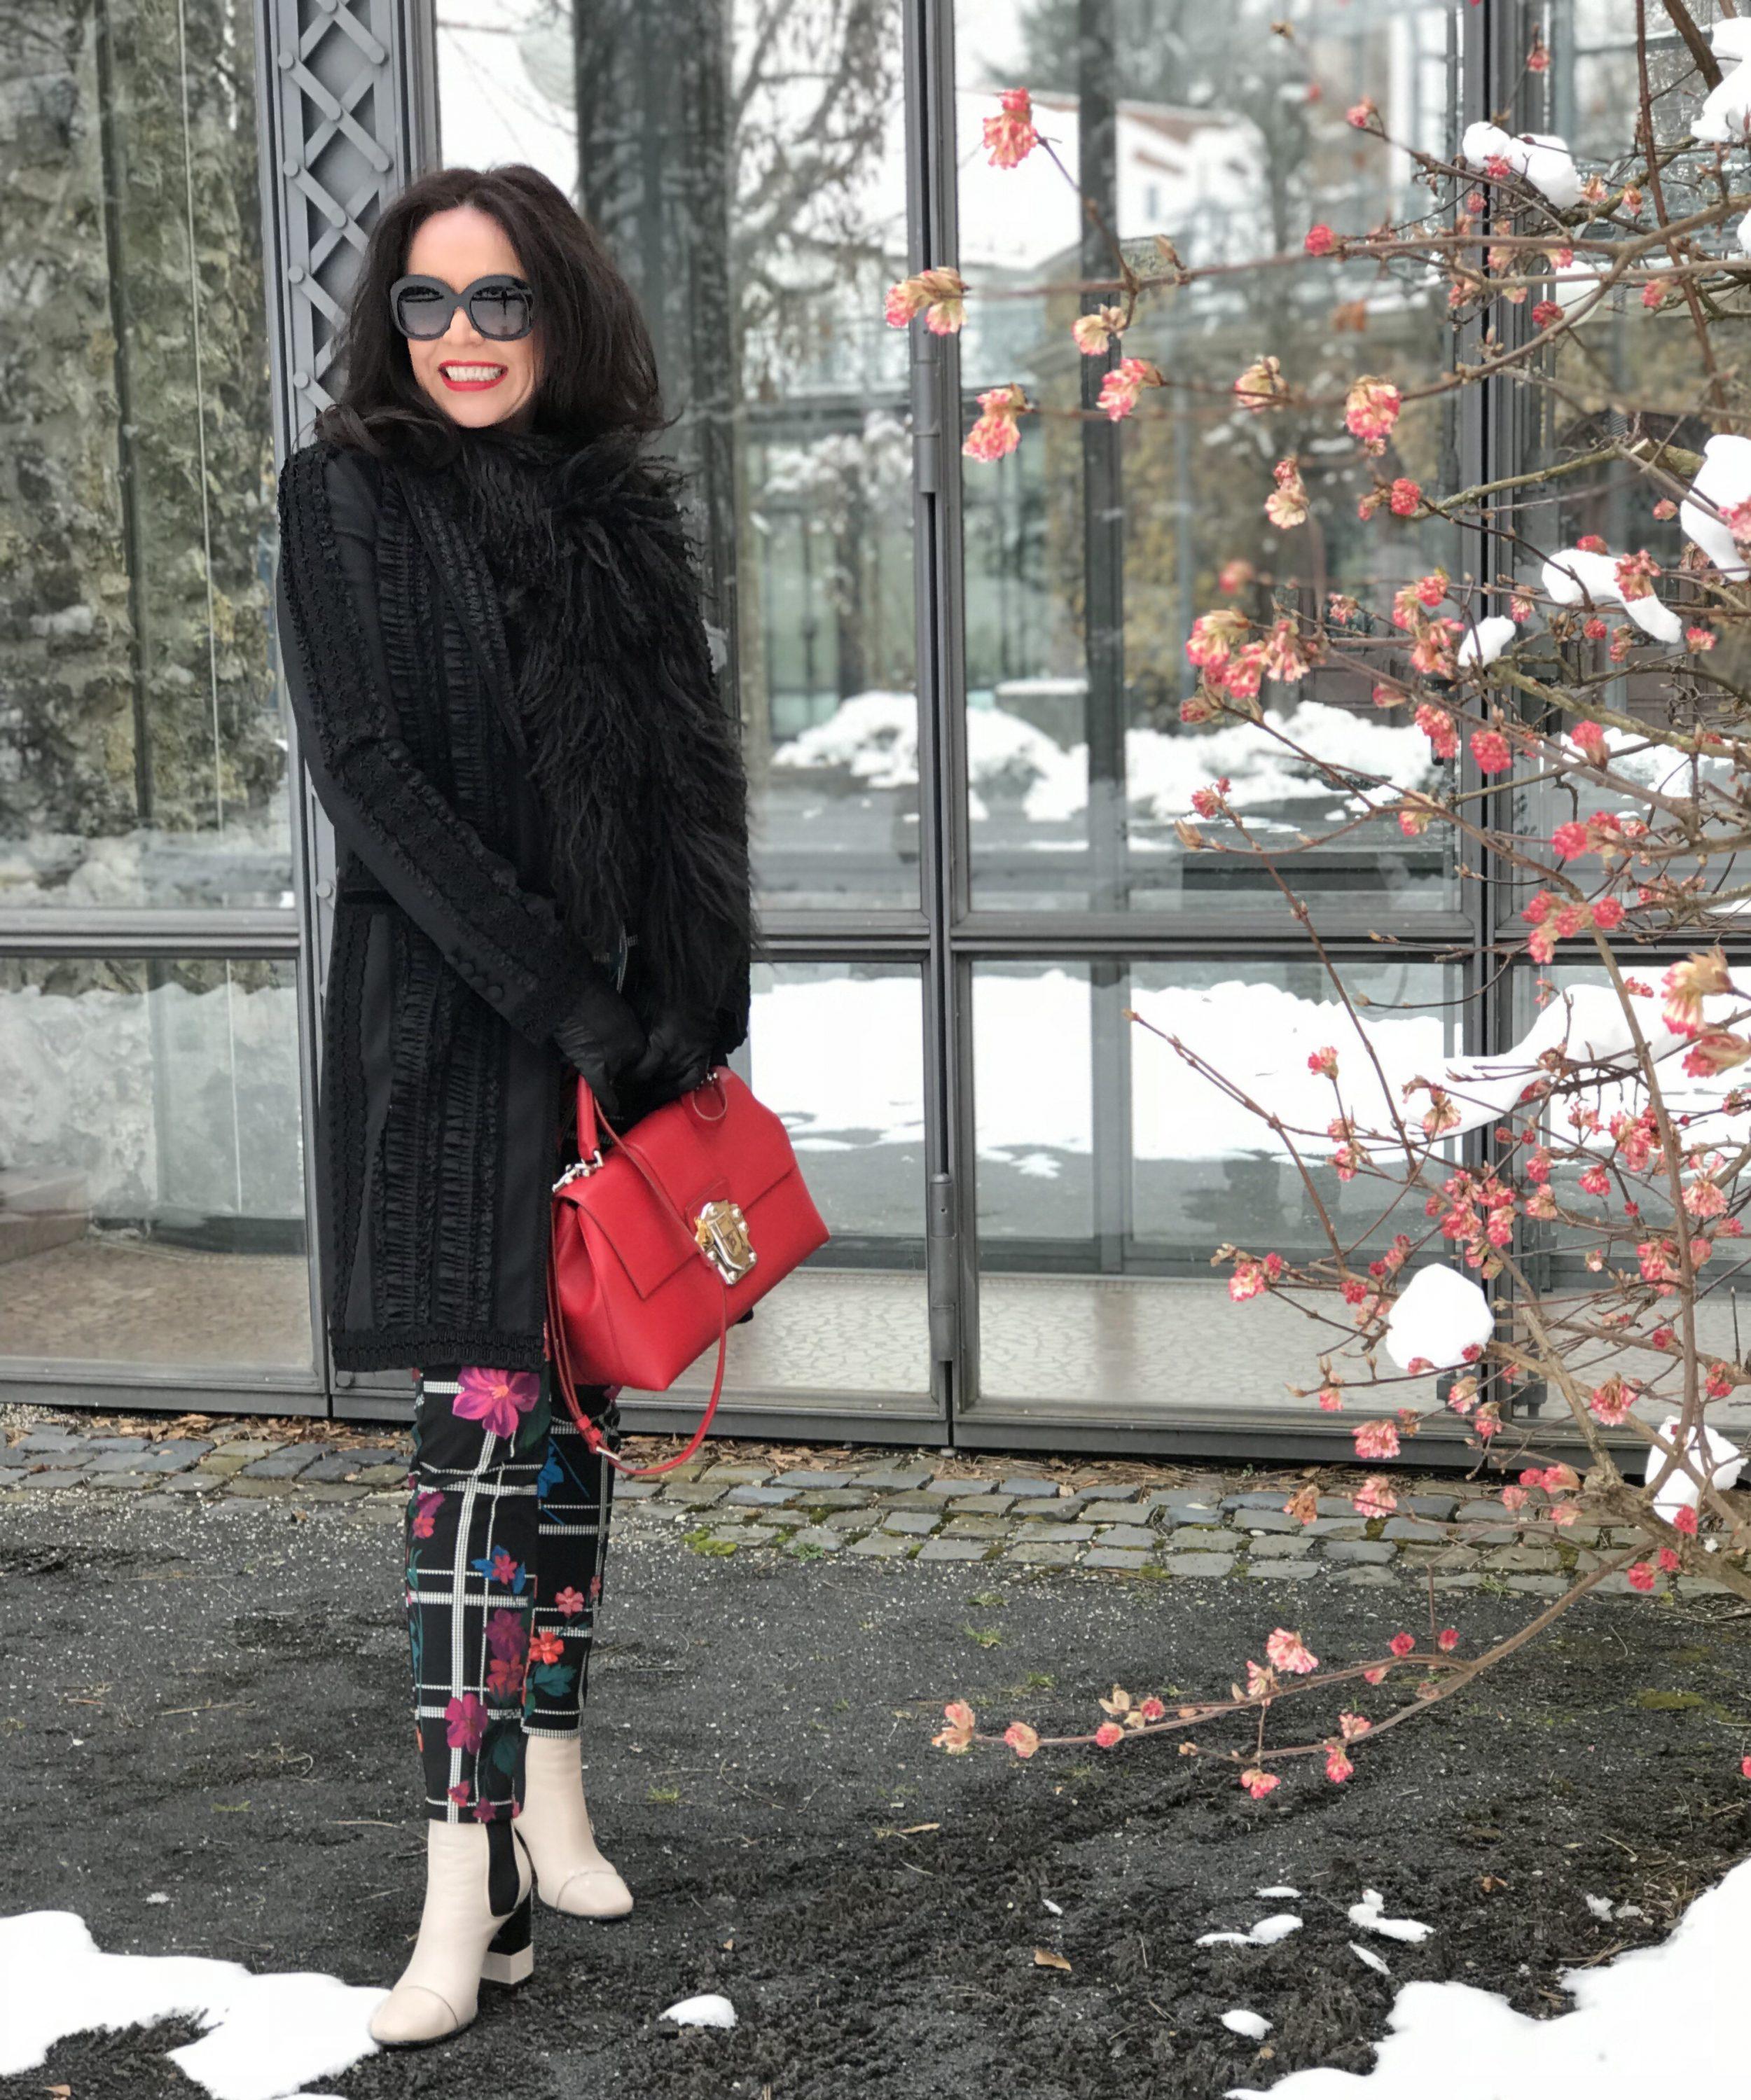 Biancoghiacco // Italian fashion